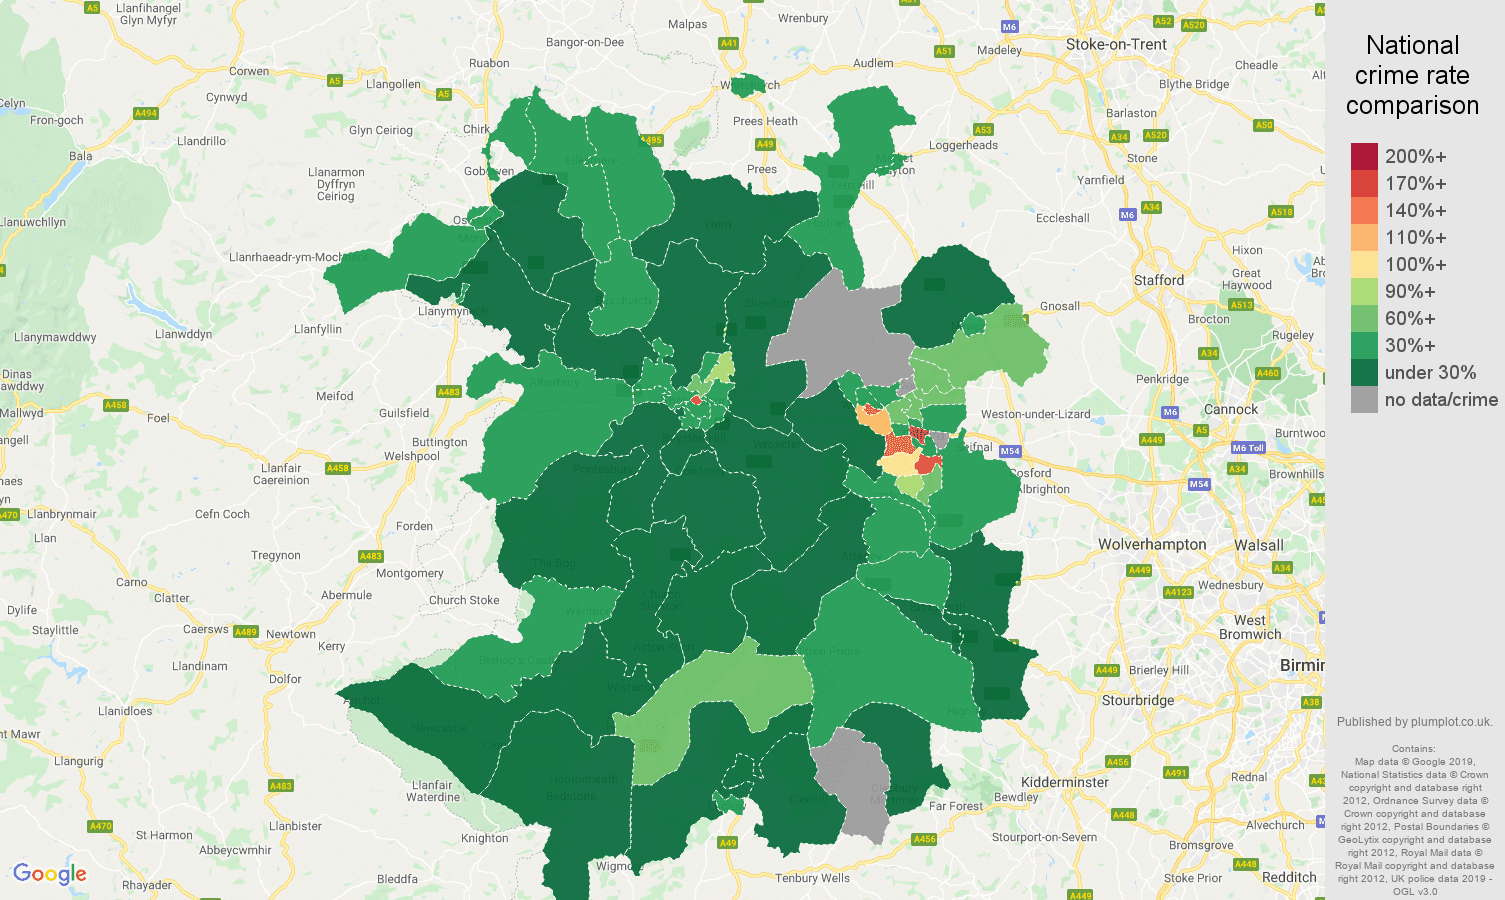 Shropshire public order crime rate comparison map